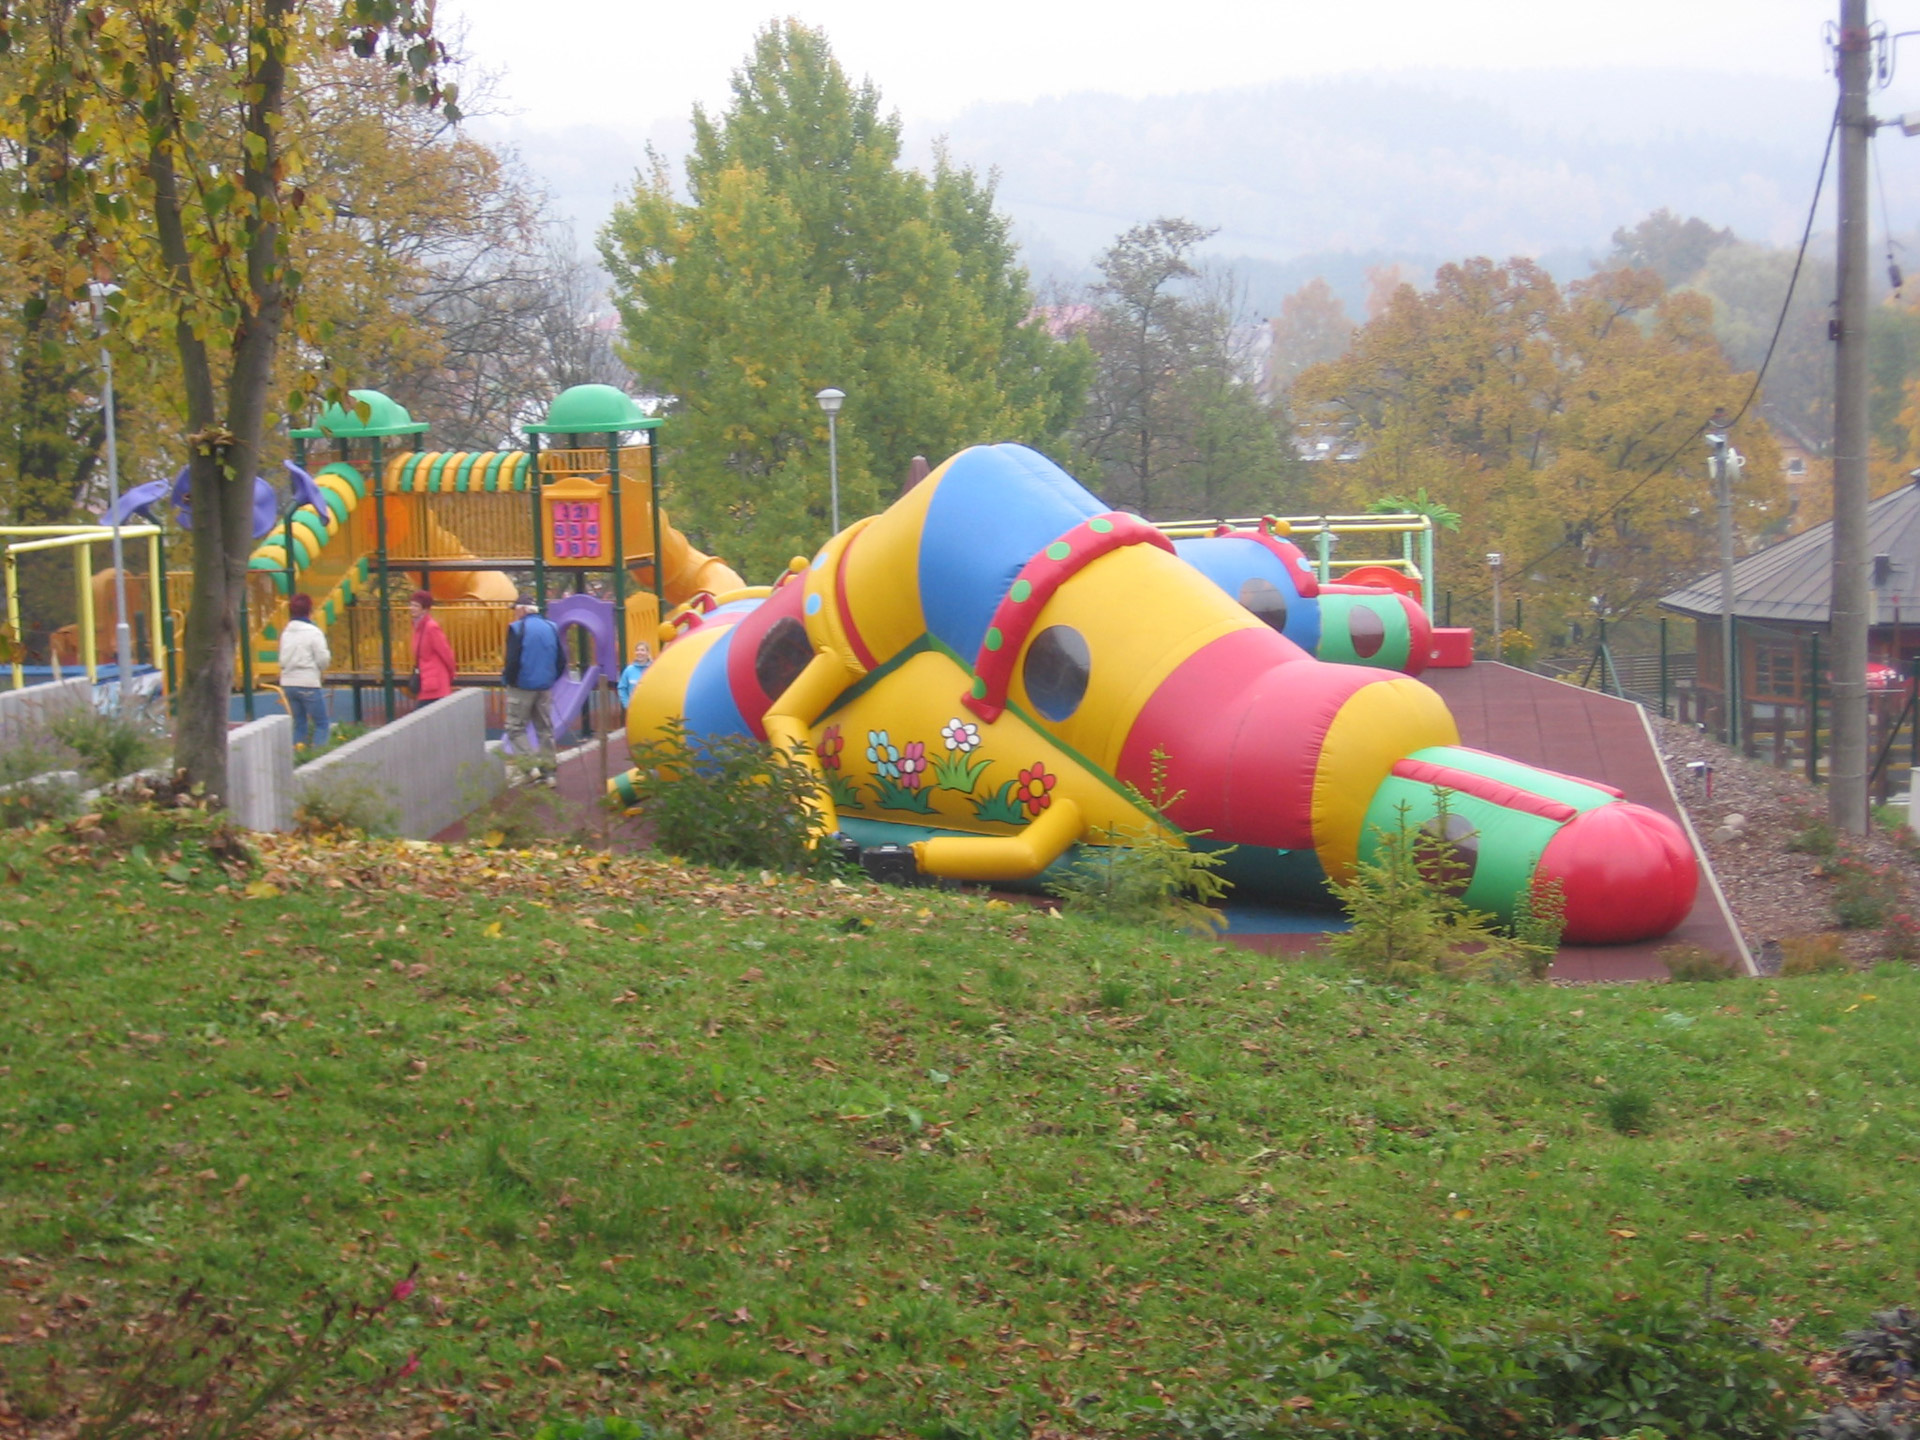 Playground, Nationl Playground Safety Week, Playing